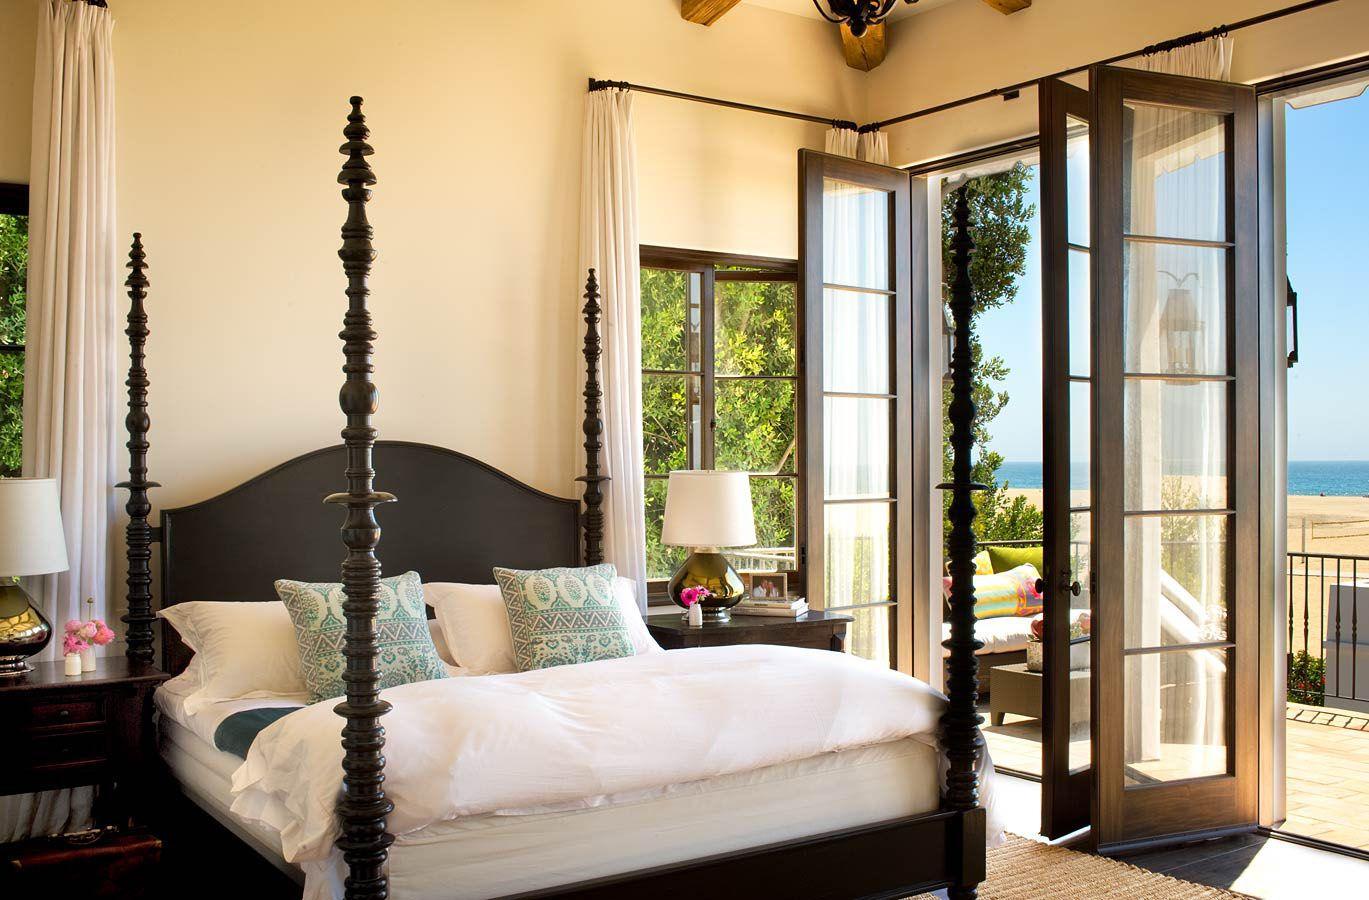 Spanish Colonial Beach House In Santa Monica | Interior Design,  Architecture U0026 Interior Decorating |